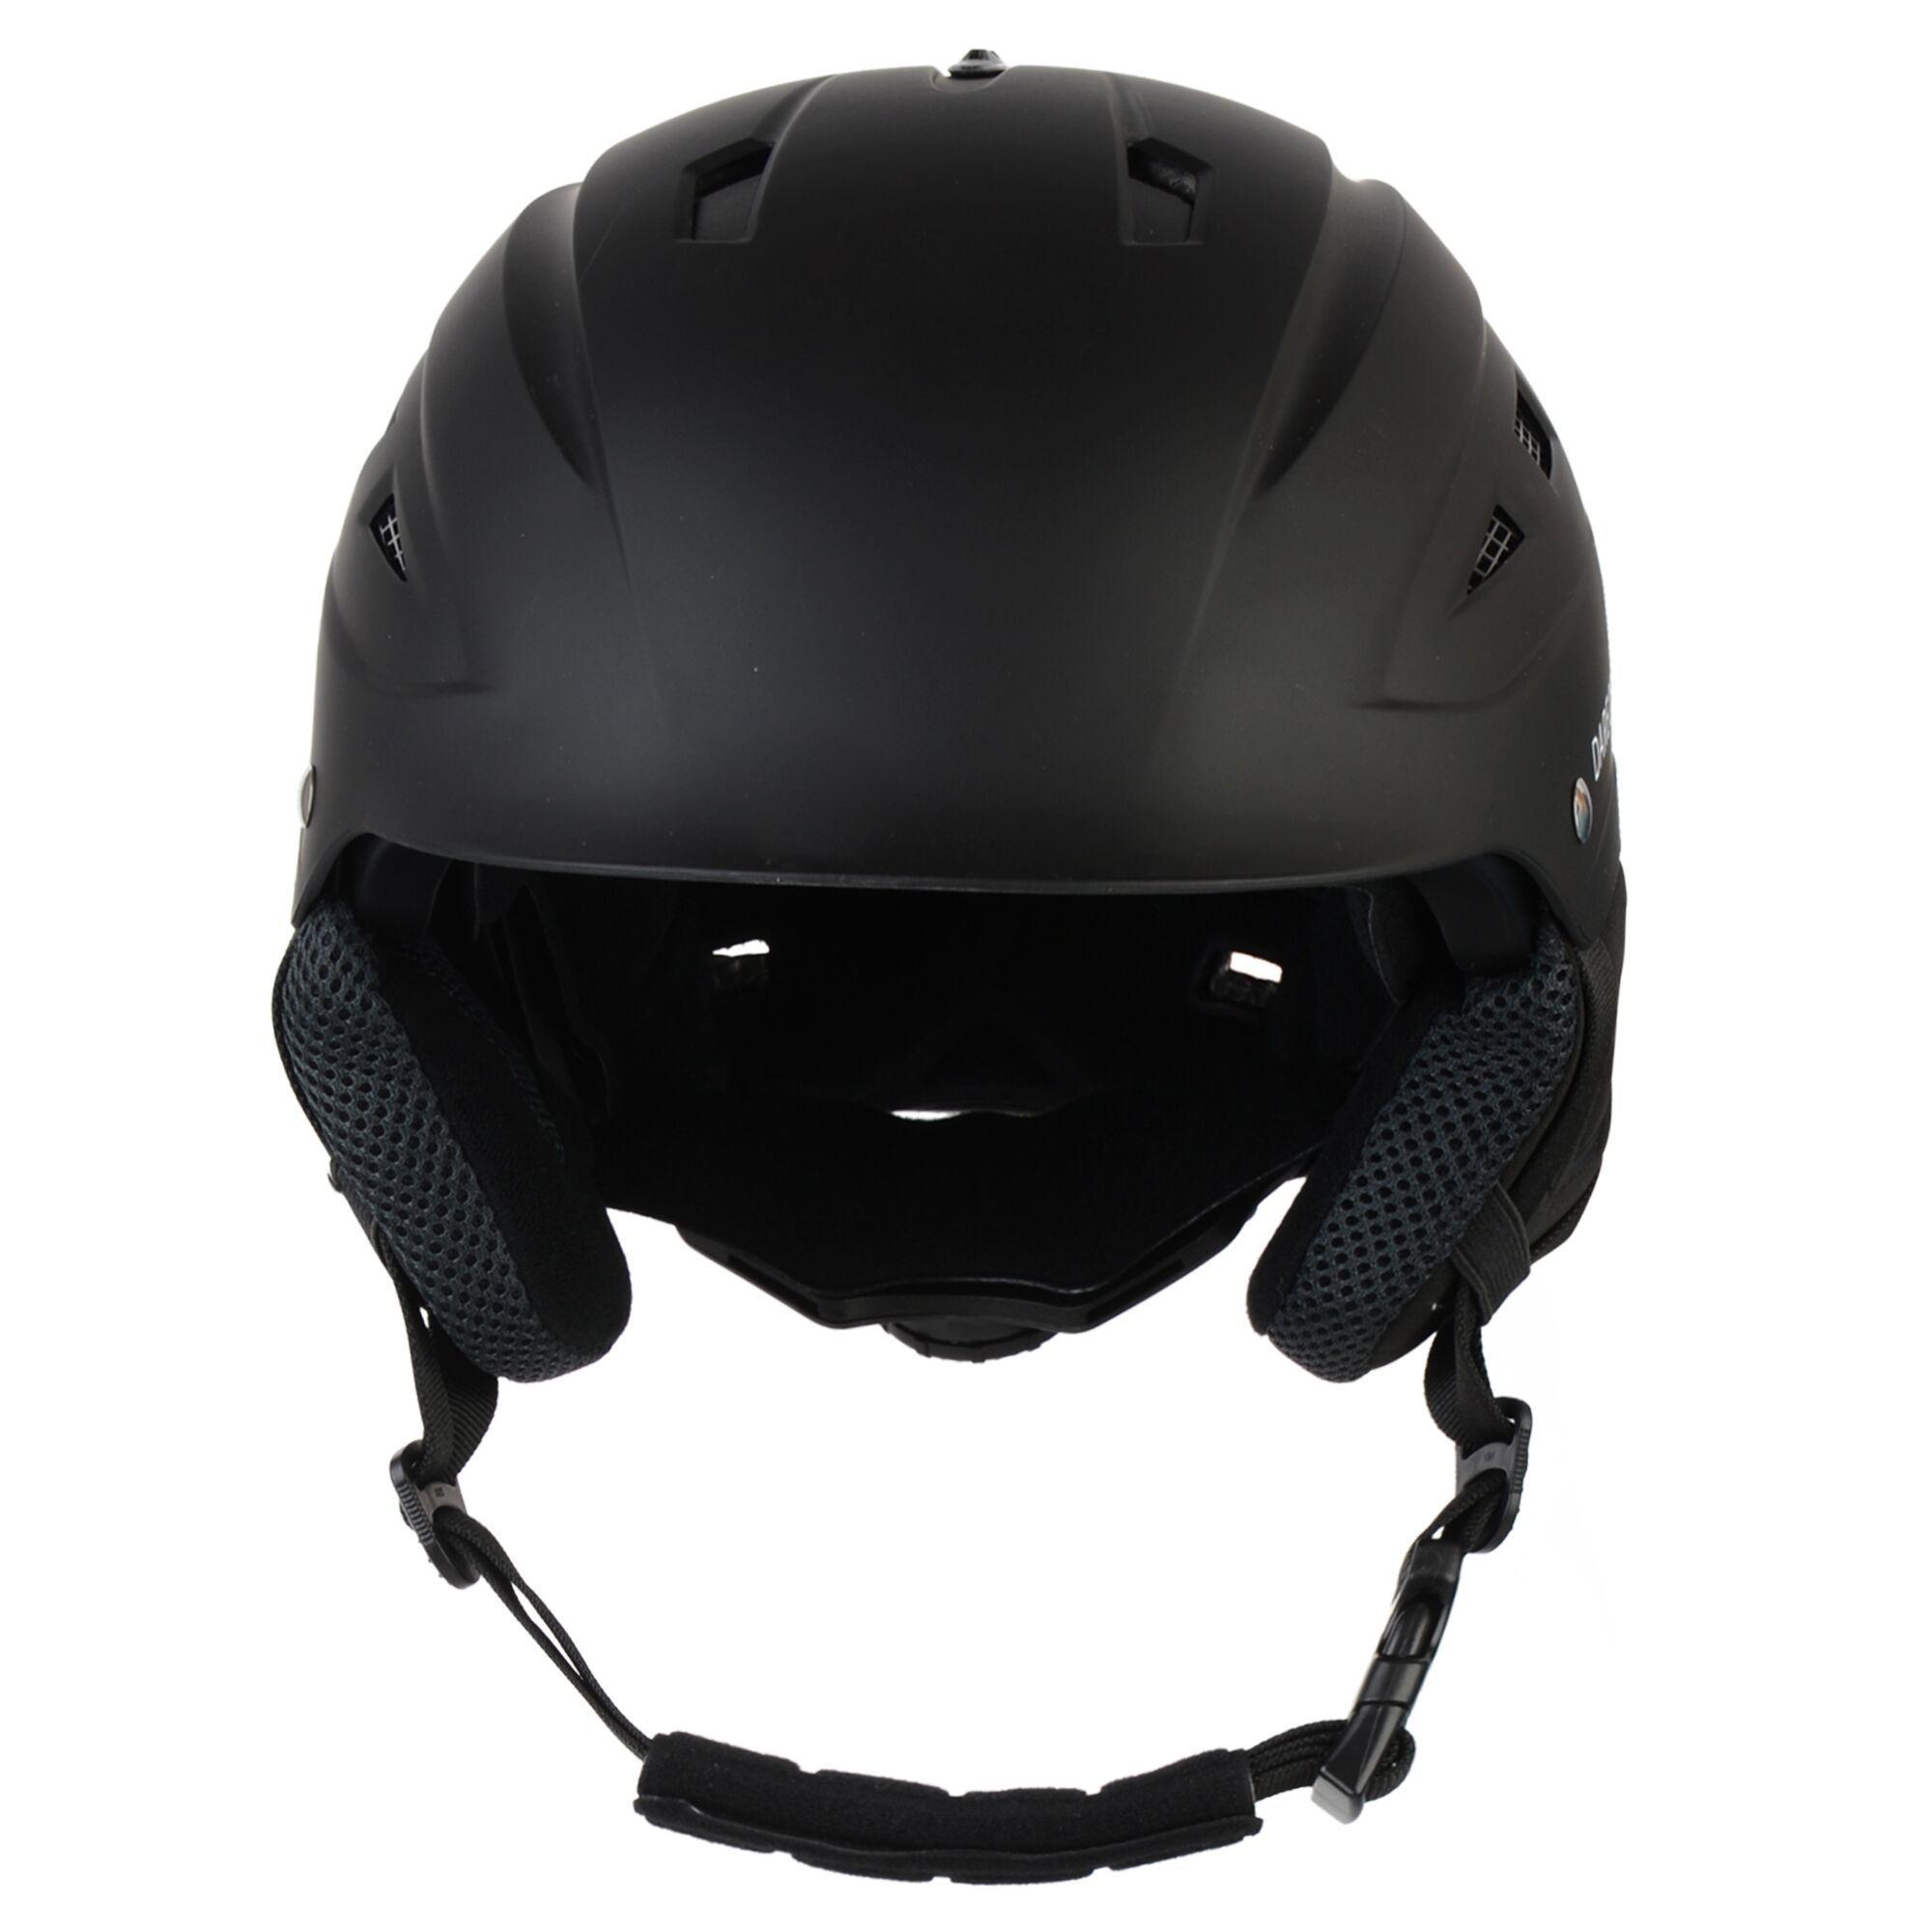 Dare 2B Childrens/Kids Cohere Ski Helmet